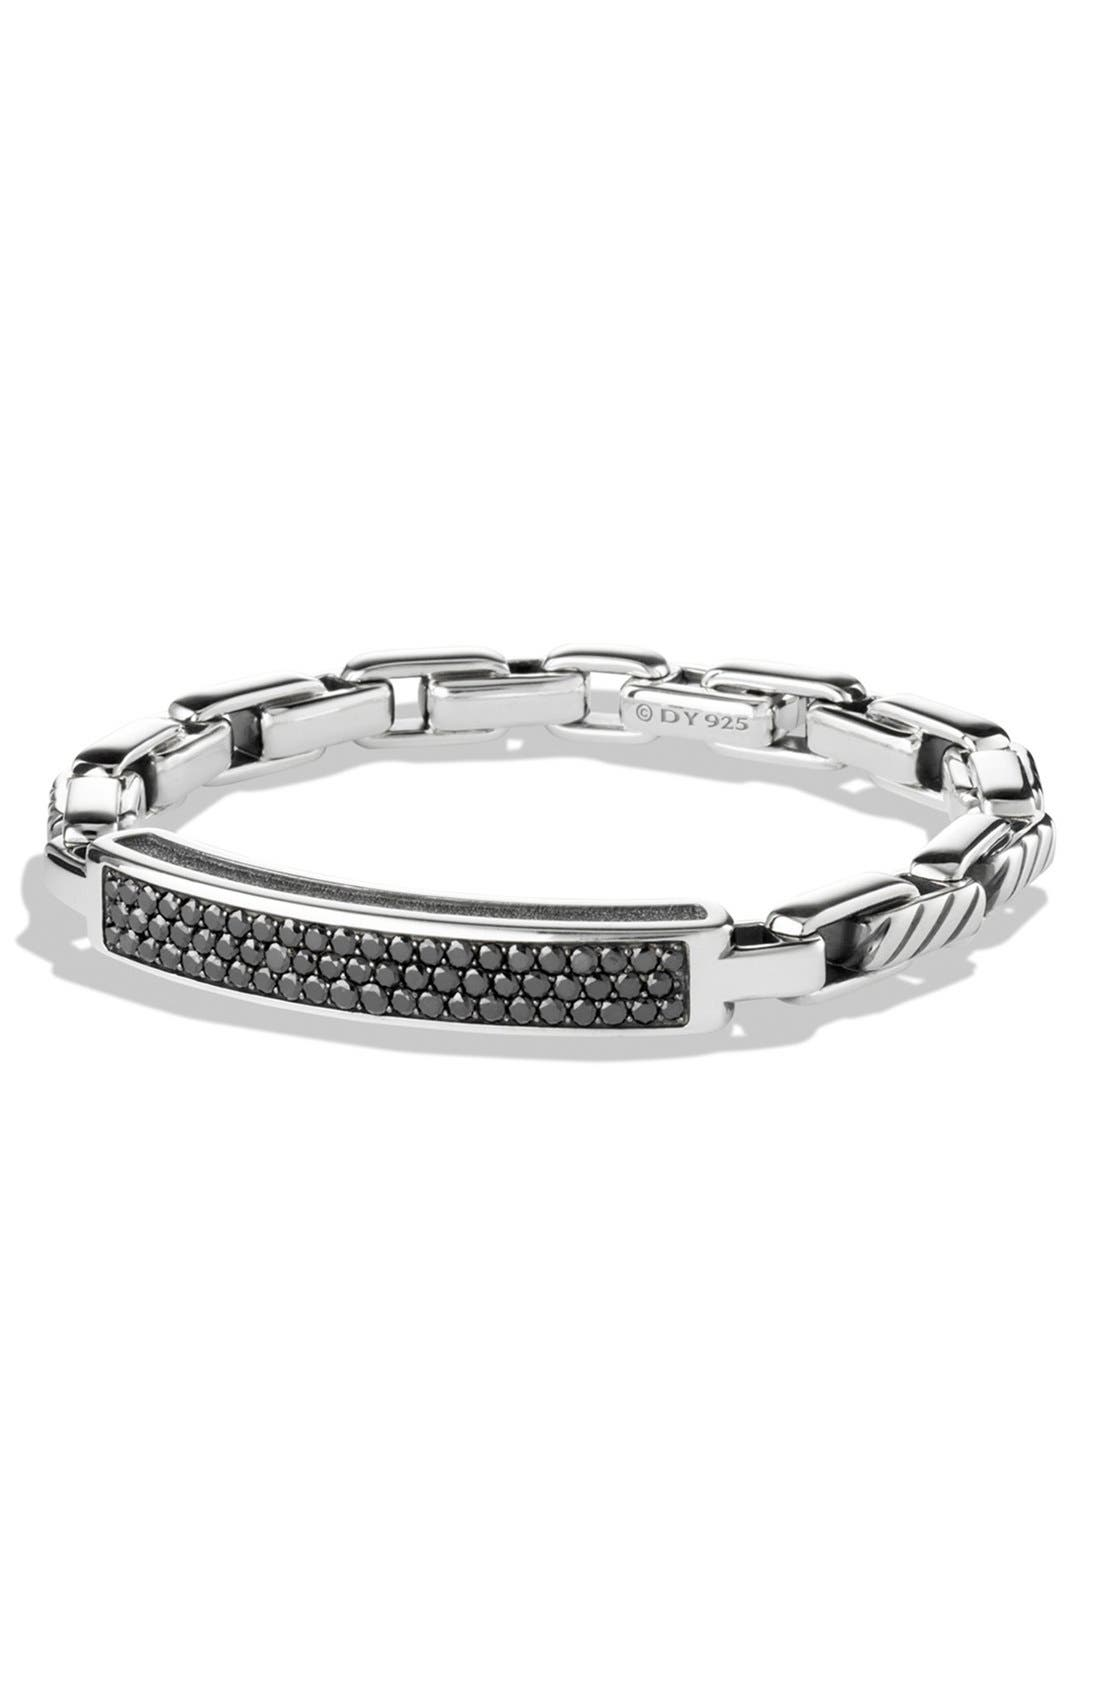 Main Image - David Yurman 'Modern Cable' ID Bracelet with Black Diamonds